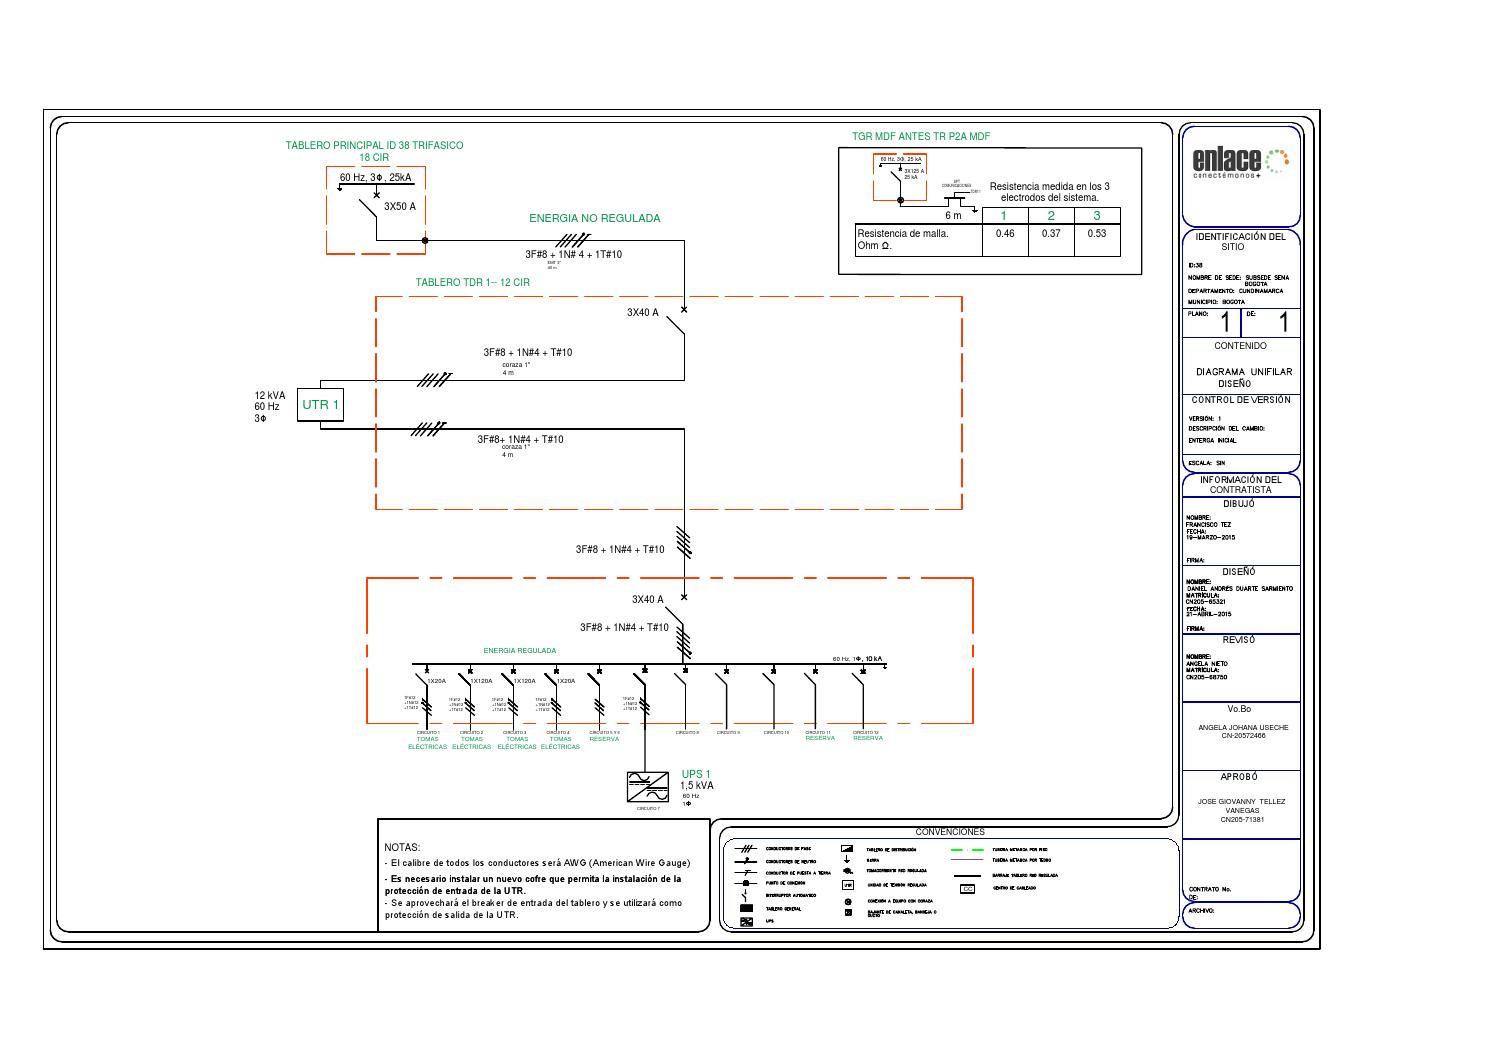 Circuito Unifilar : Diagrama unifilar id v by a lo libre issuu